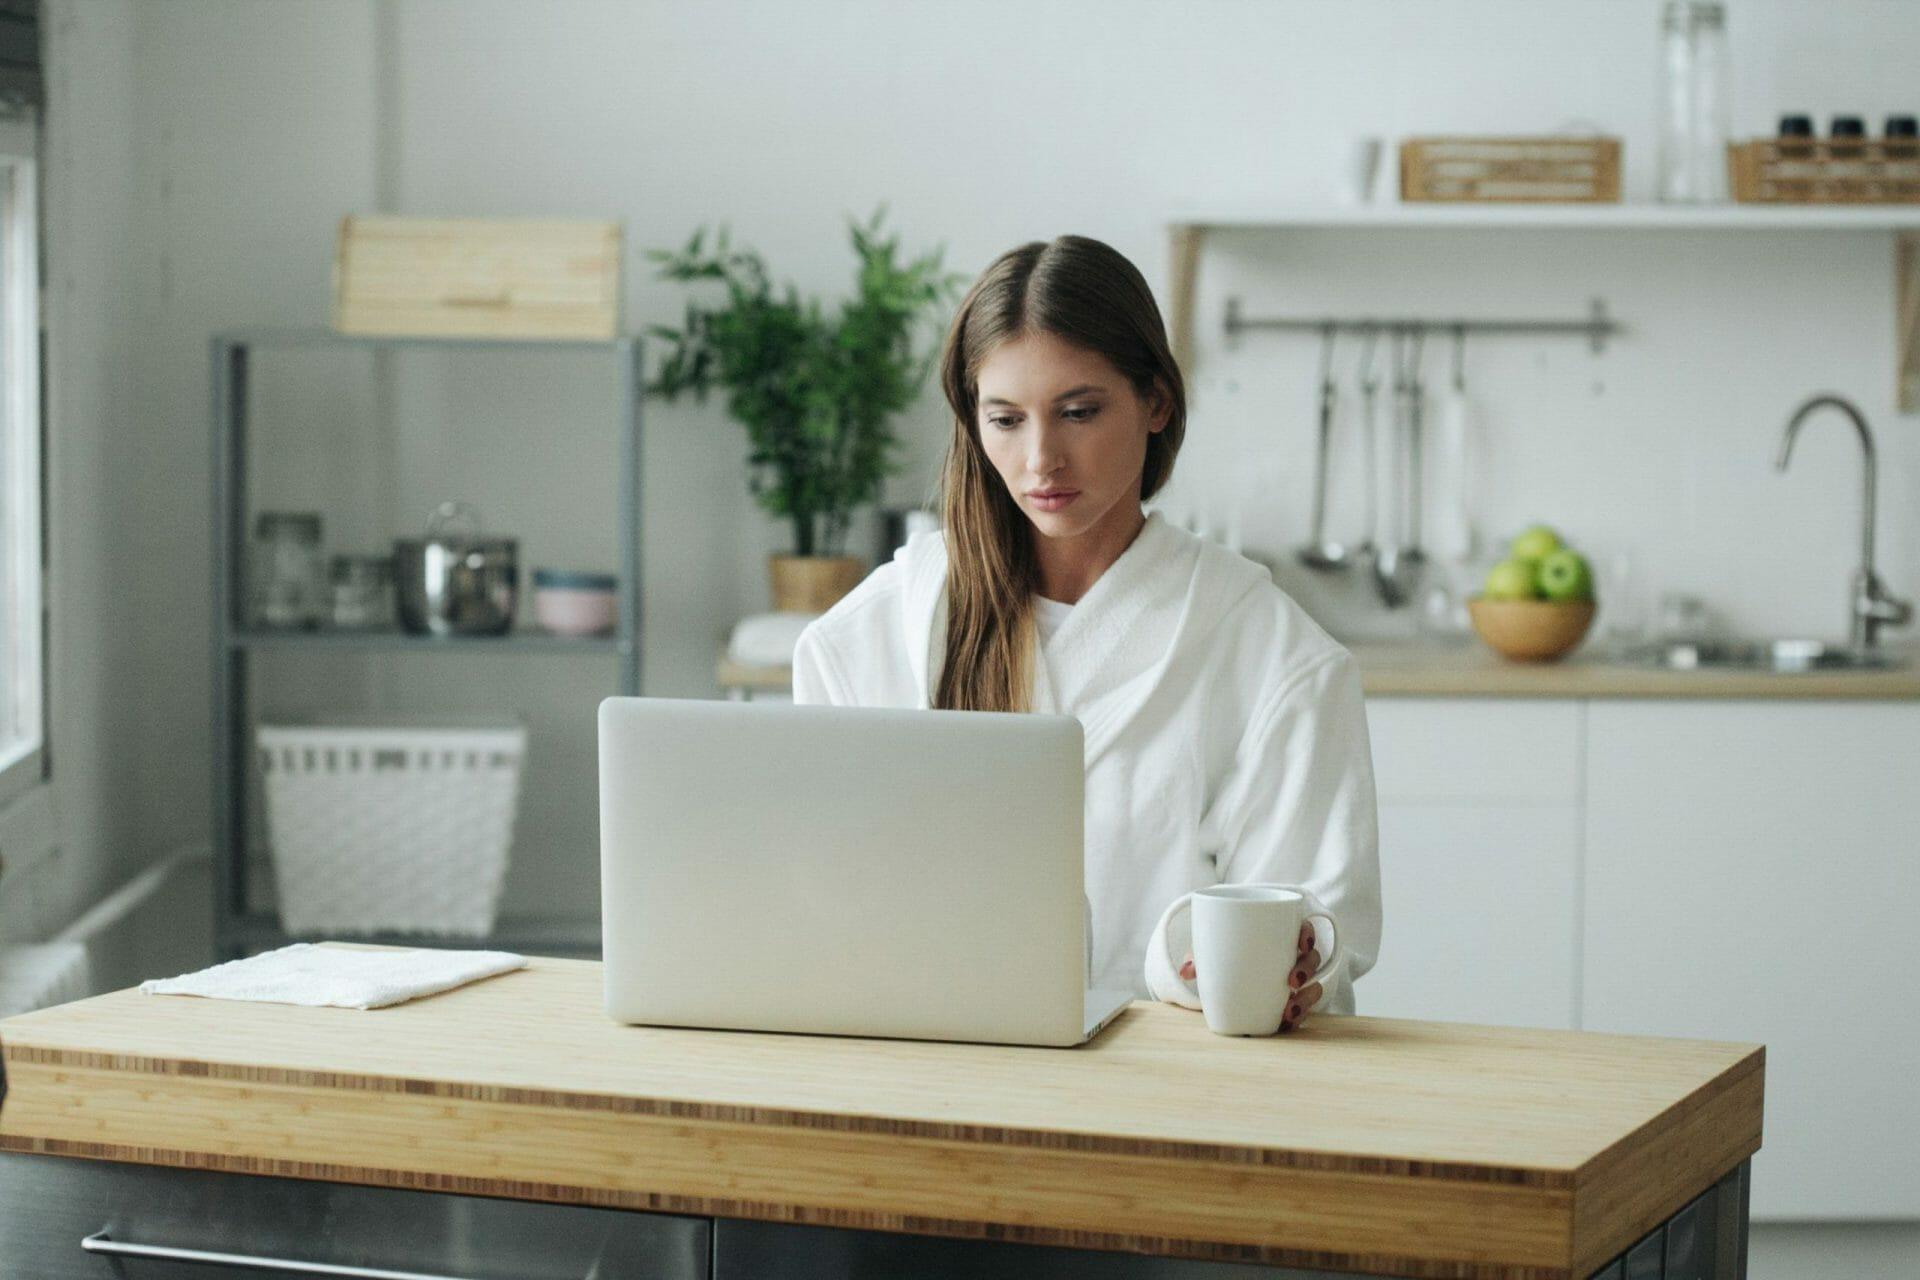 woman working in kitchen